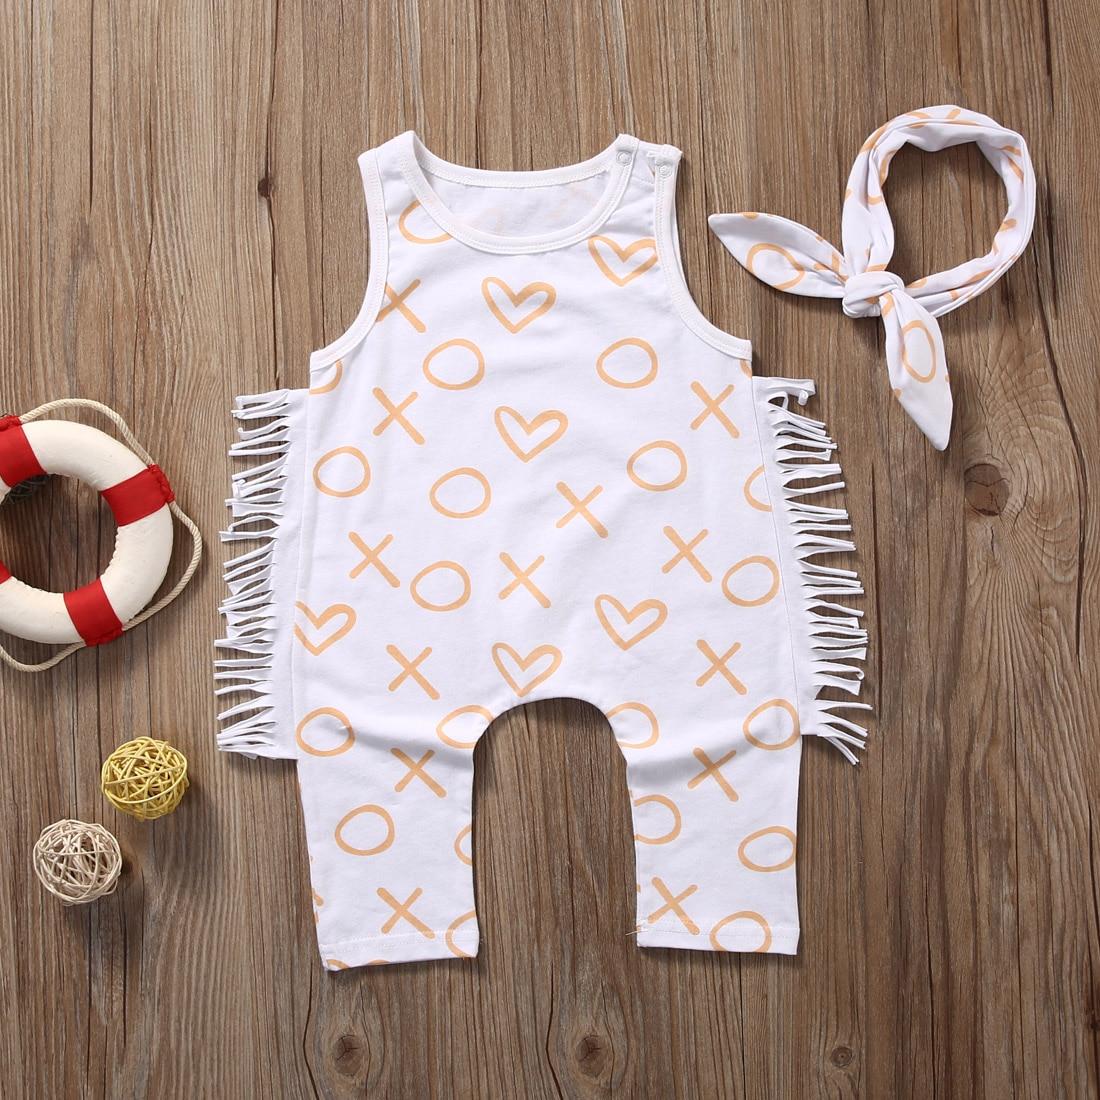 Newborn Baby Girl Clothes Summer Geometric Sleeveless Tassel Romper +Headband 2PCS Set Outfit Sunsuit Princess Girls Costume